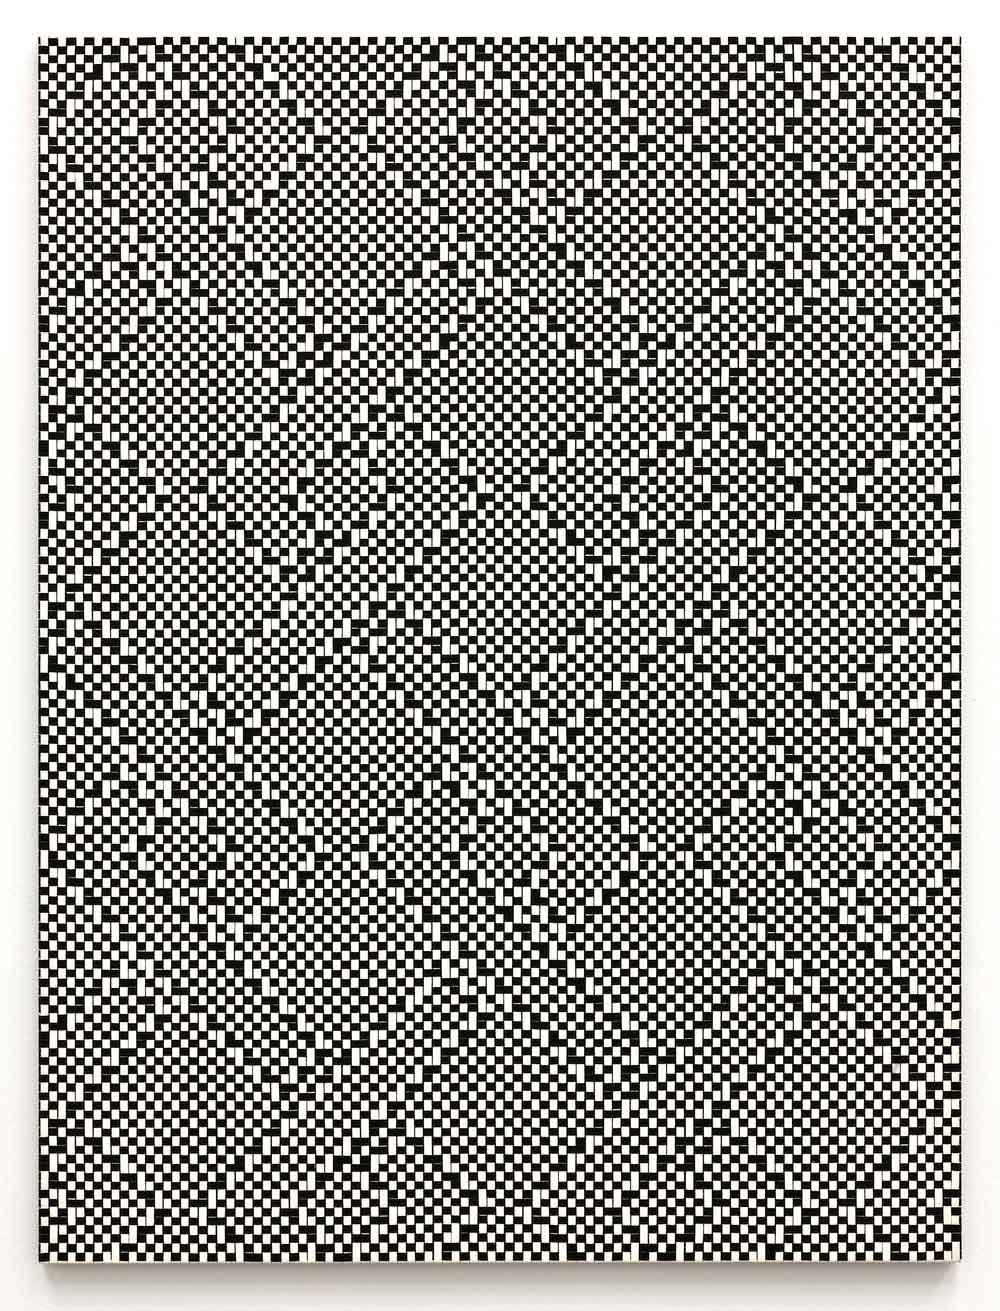 0304 Shadow Weave Tauba Auerbach | Yellowtrace